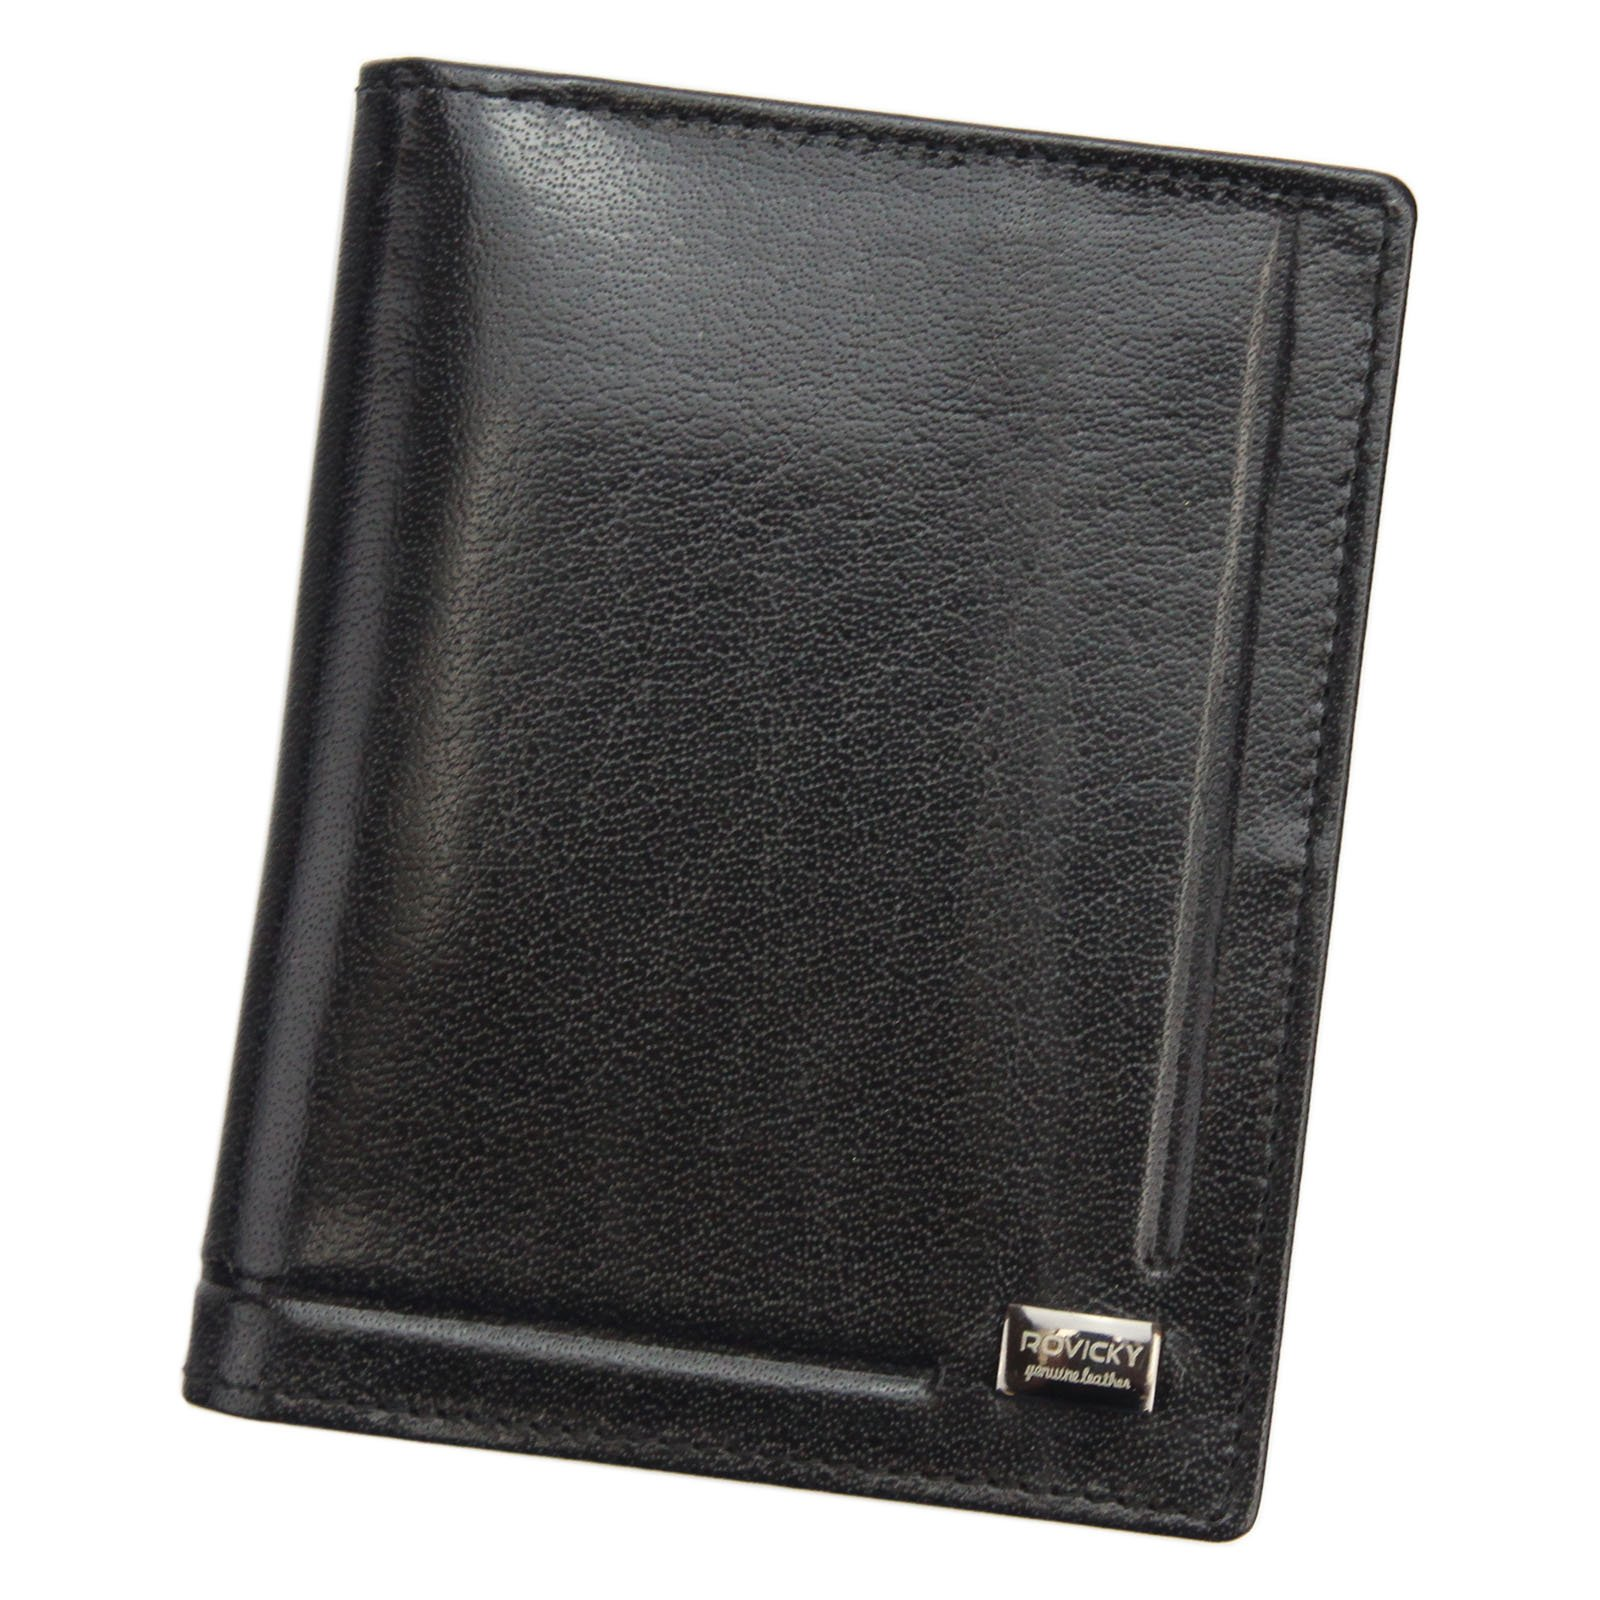 Puzdro na karty a doklady Rovicky PC-041-BAR RFID